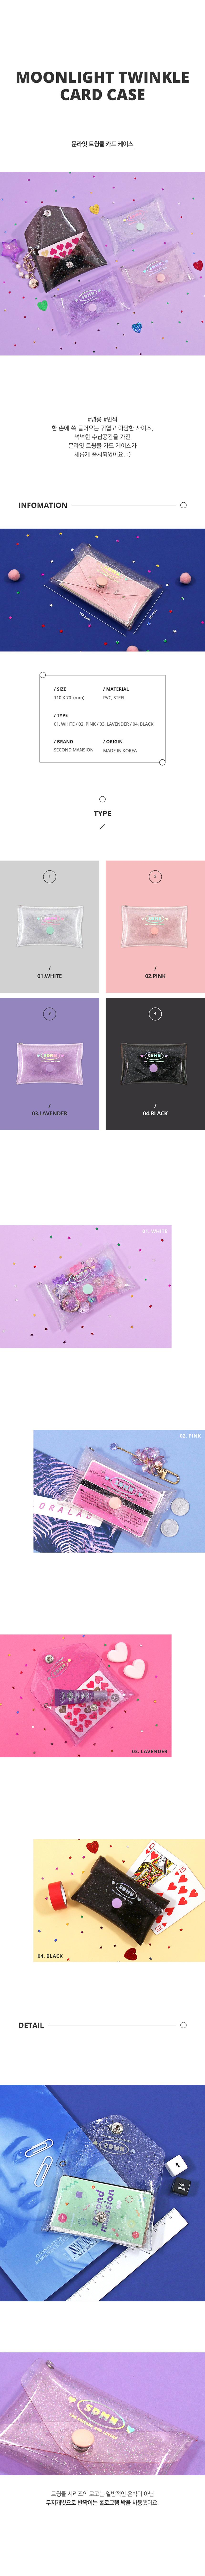 MOONLIGHT TWINKLE CARD CASE - 세컨드맨션, 6,800원, 동전/카드지갑, 카드지갑